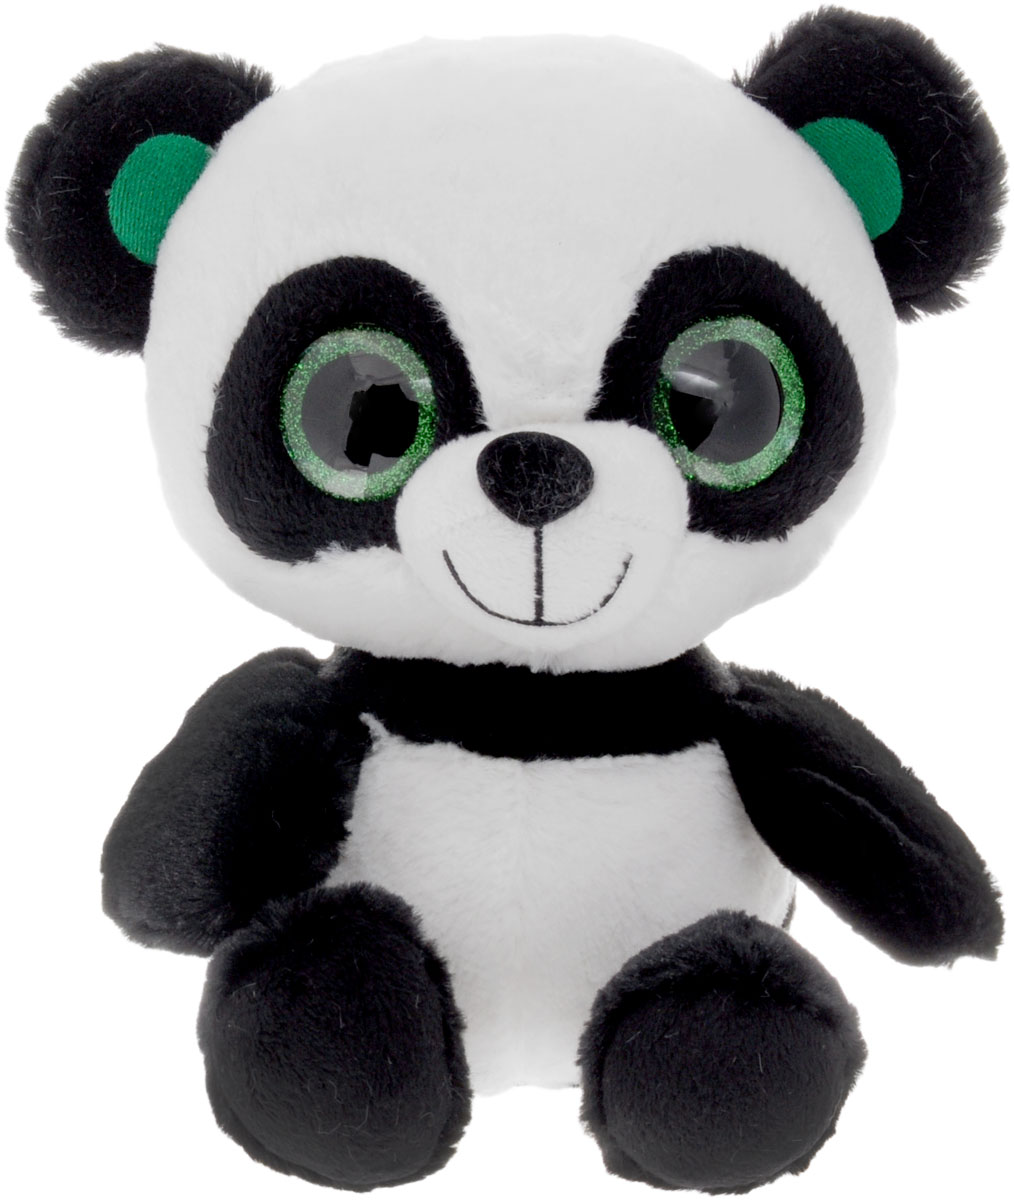 Fancy Мягкая игрушка Панда Глазастик 25 см fancy мягкая игрушка собака соня 70 см